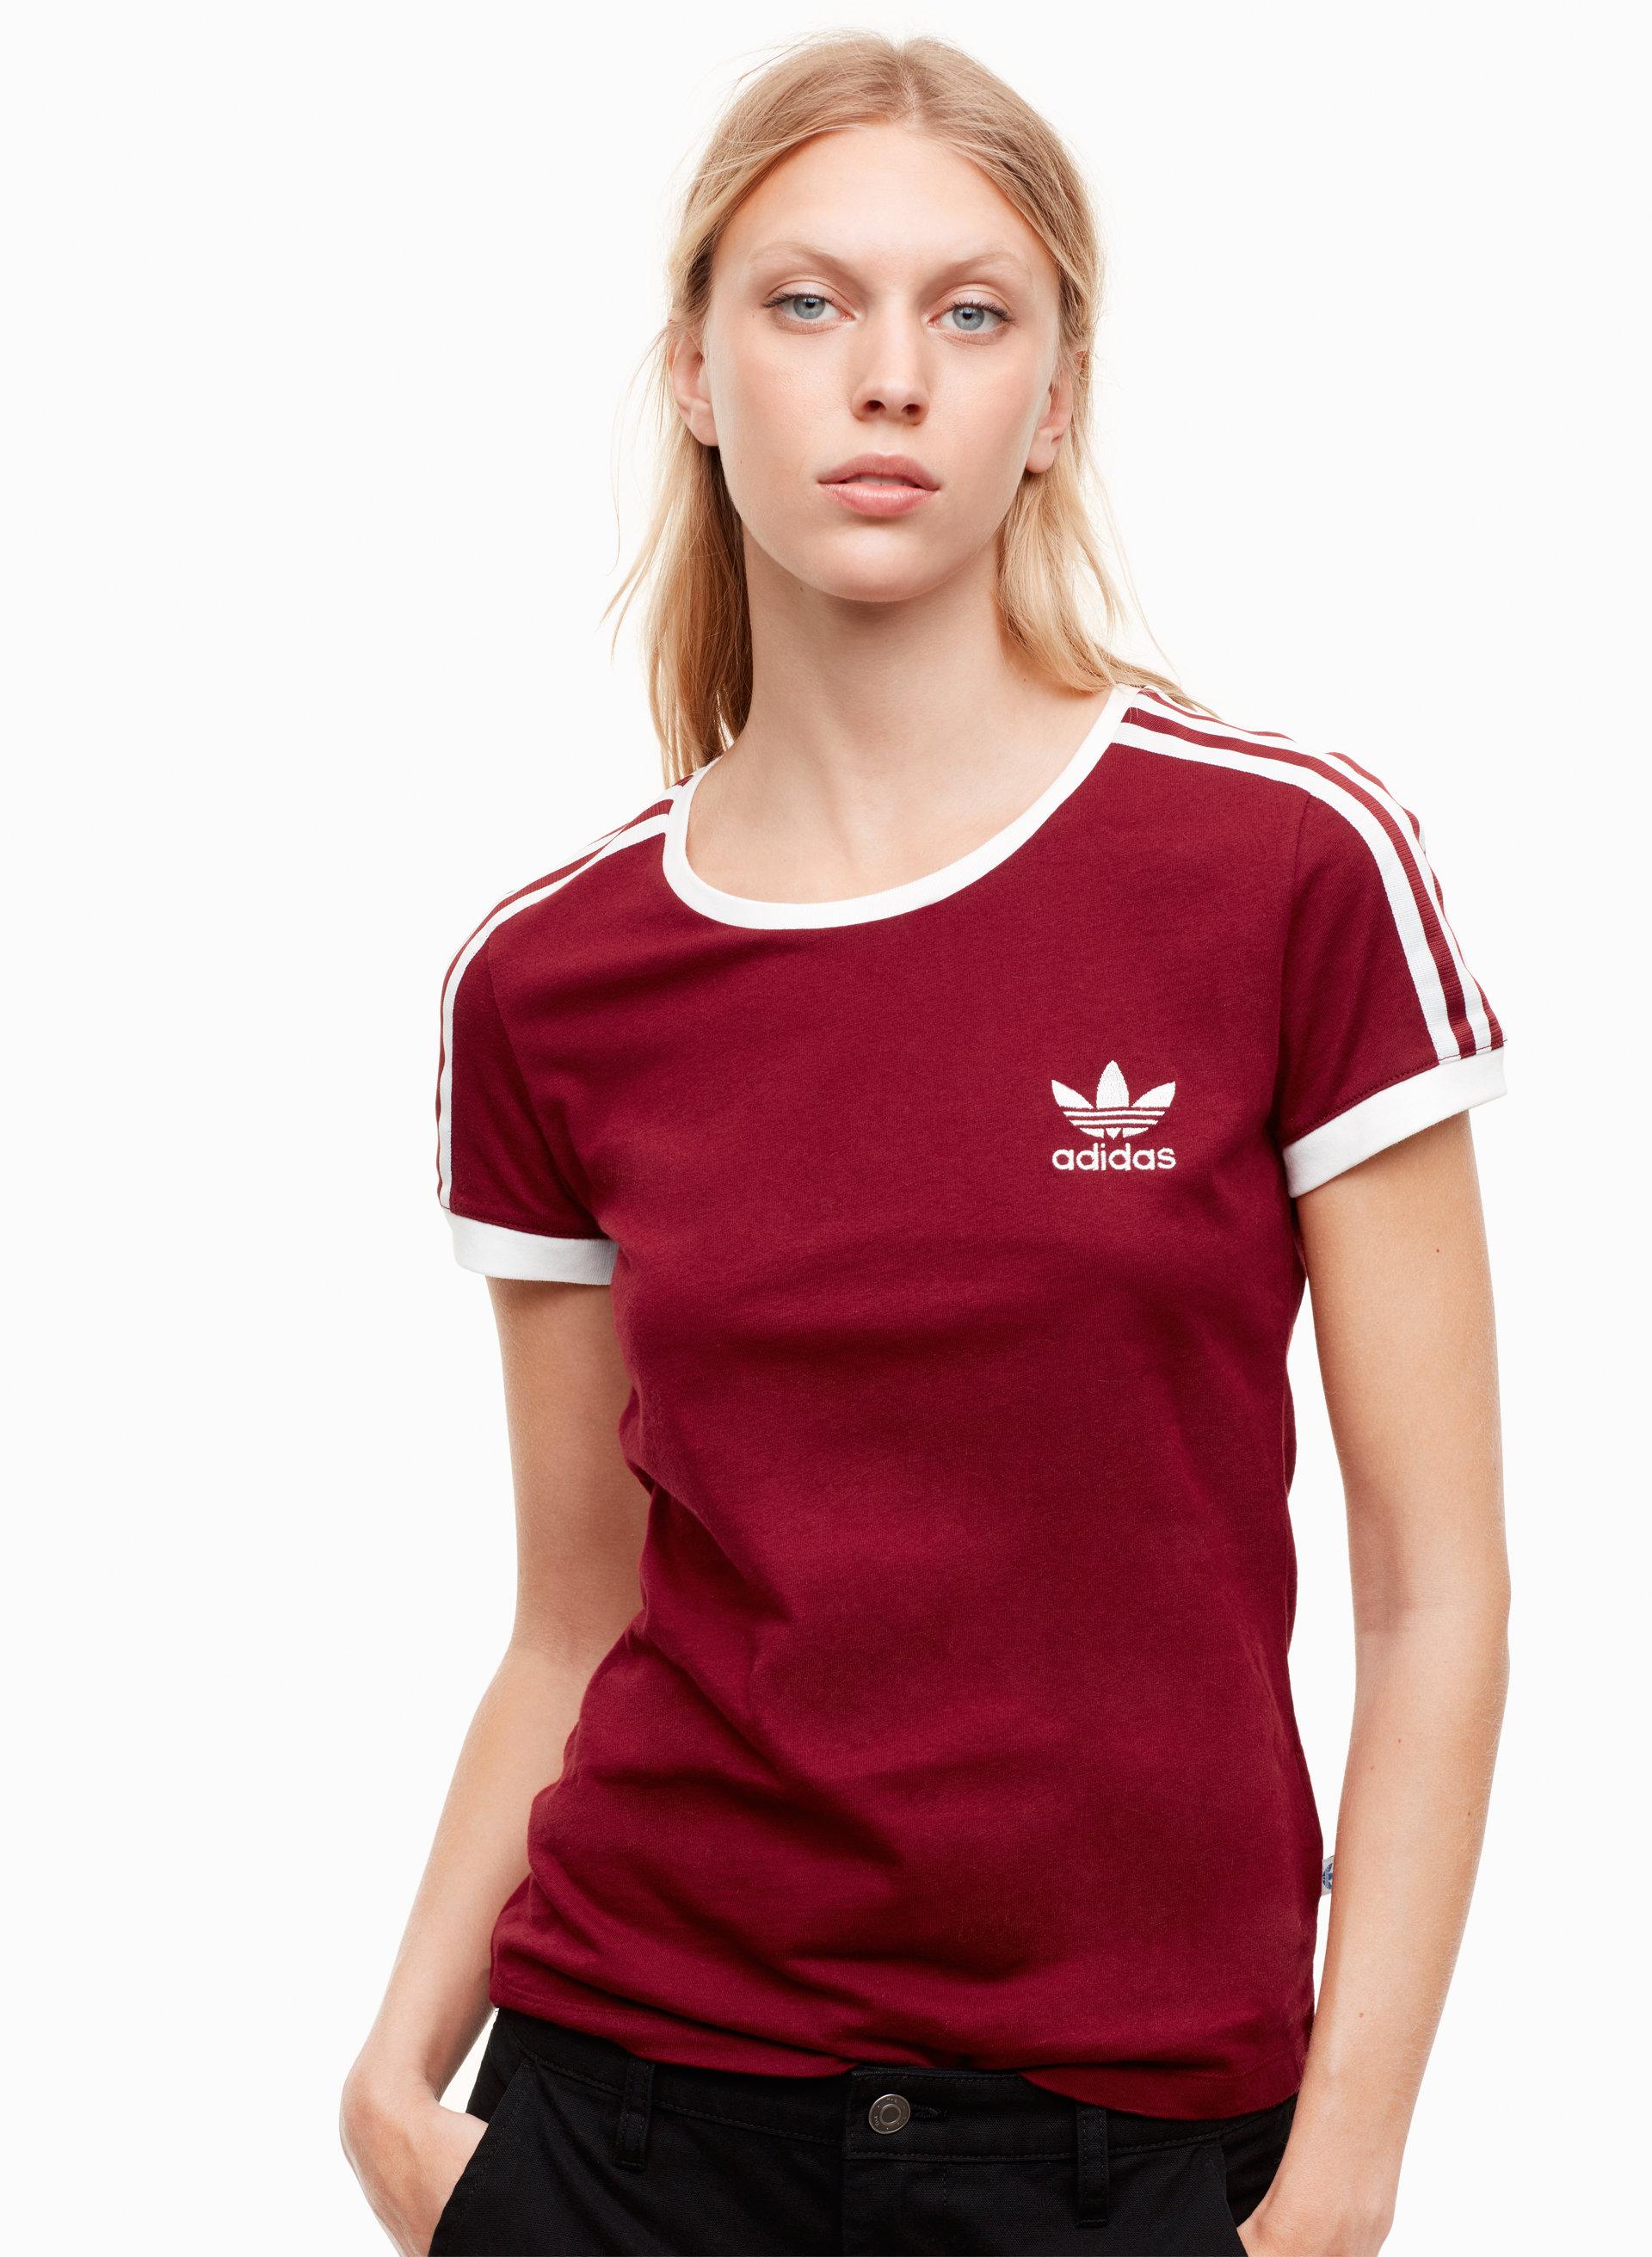 Adidas T Shirt Ca 1977Aritzia Sandra uiZPXk